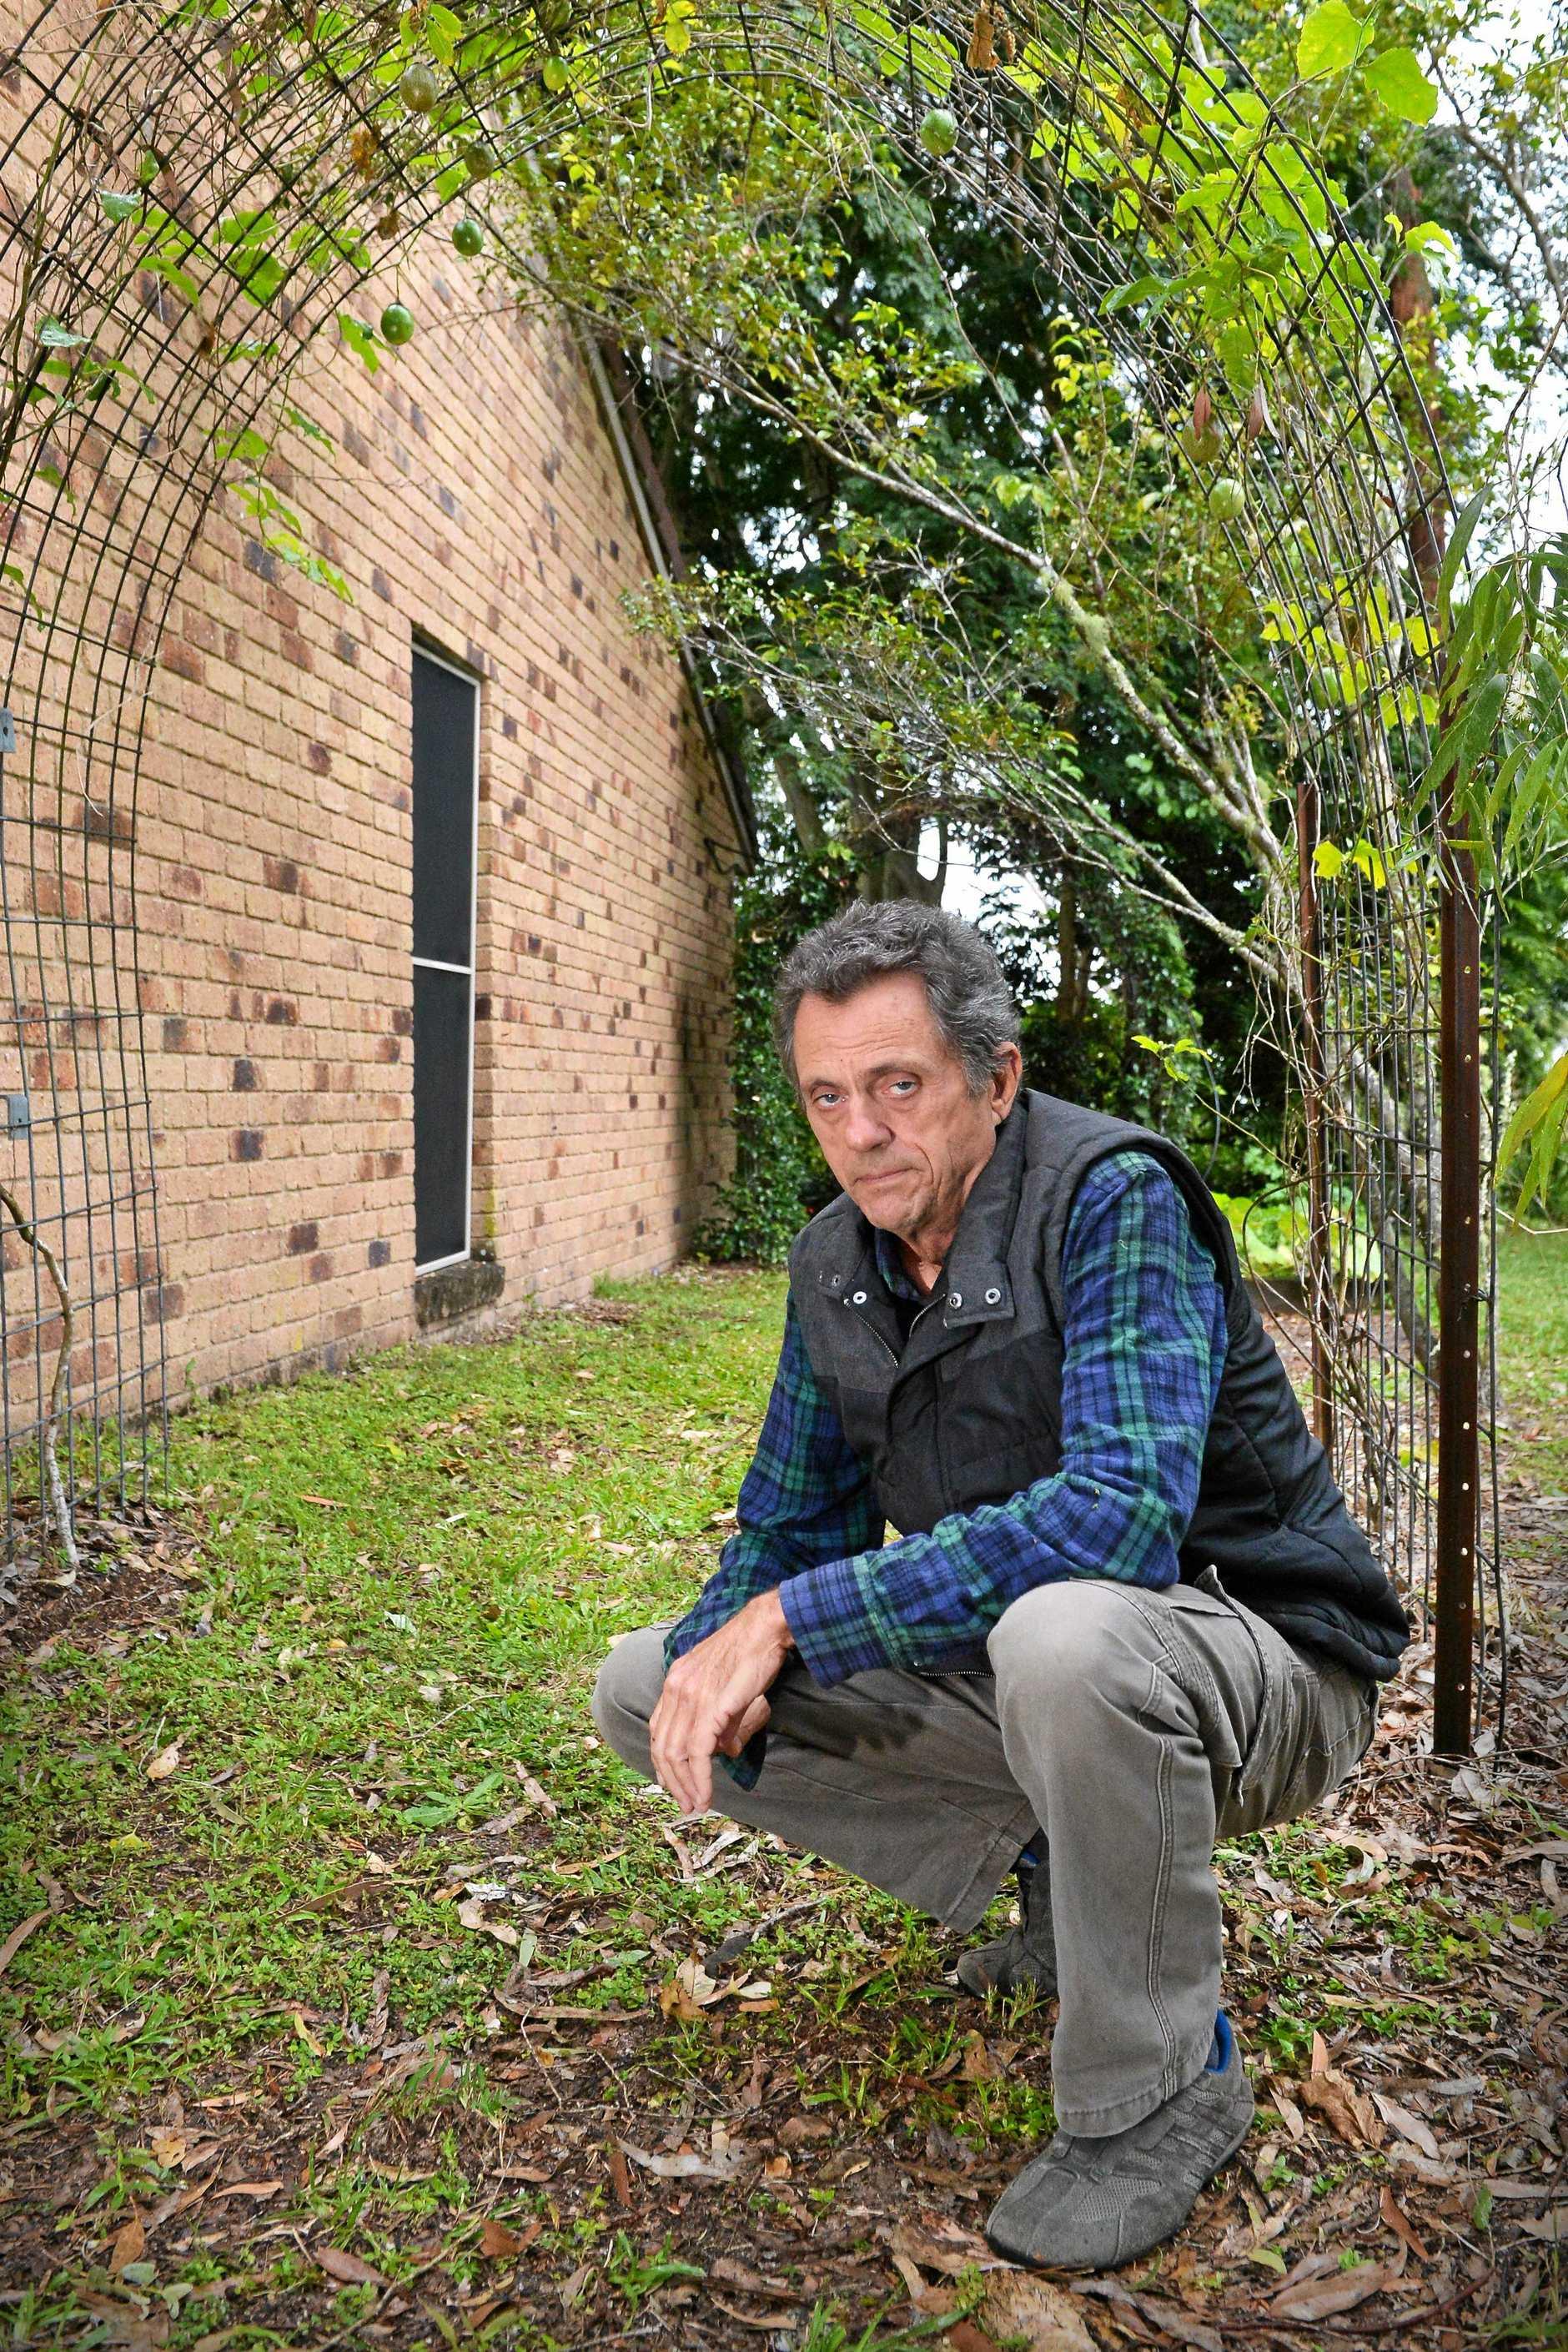 Yandina based naturalist Greg Roberts